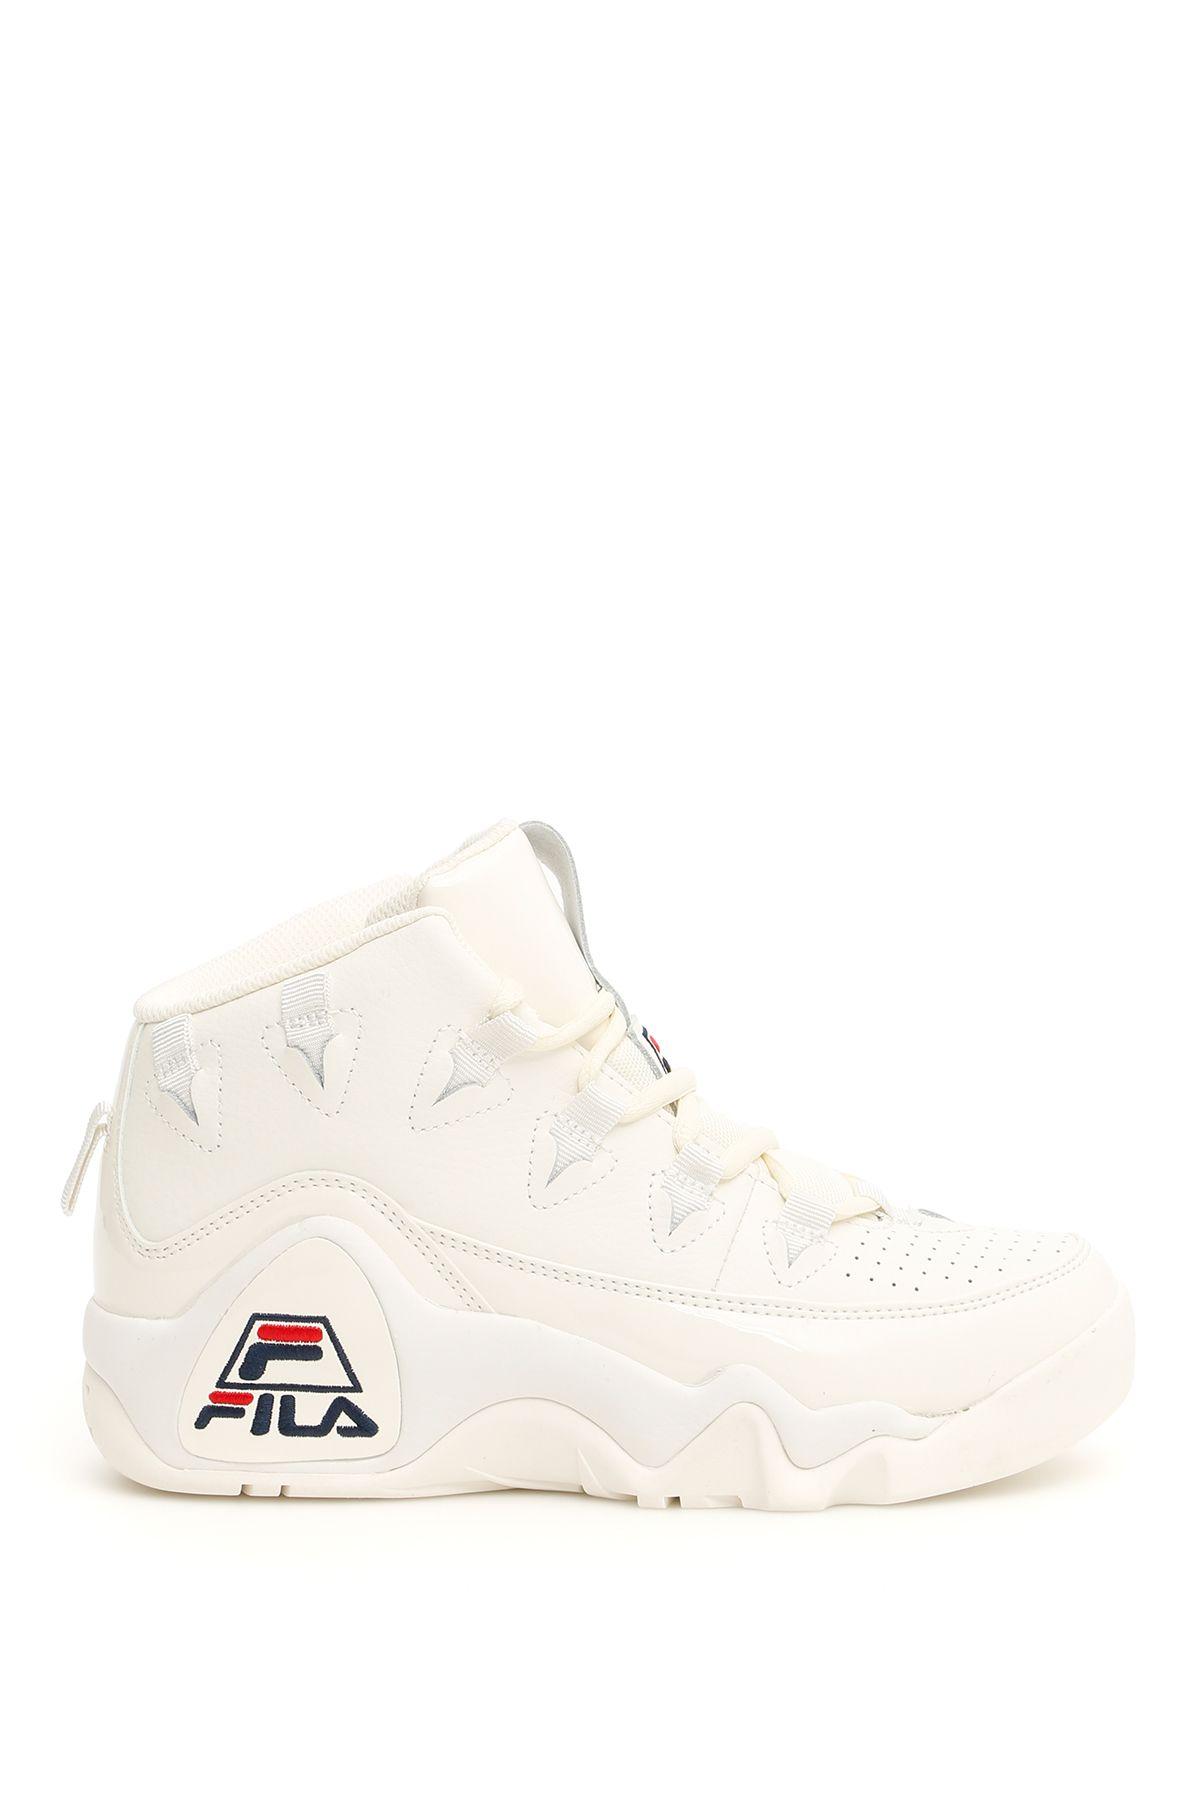 8e03dc22557 Fila Fila Grant Hill Sneakers - WHITE NAVY RED (White) - 10763069 ...